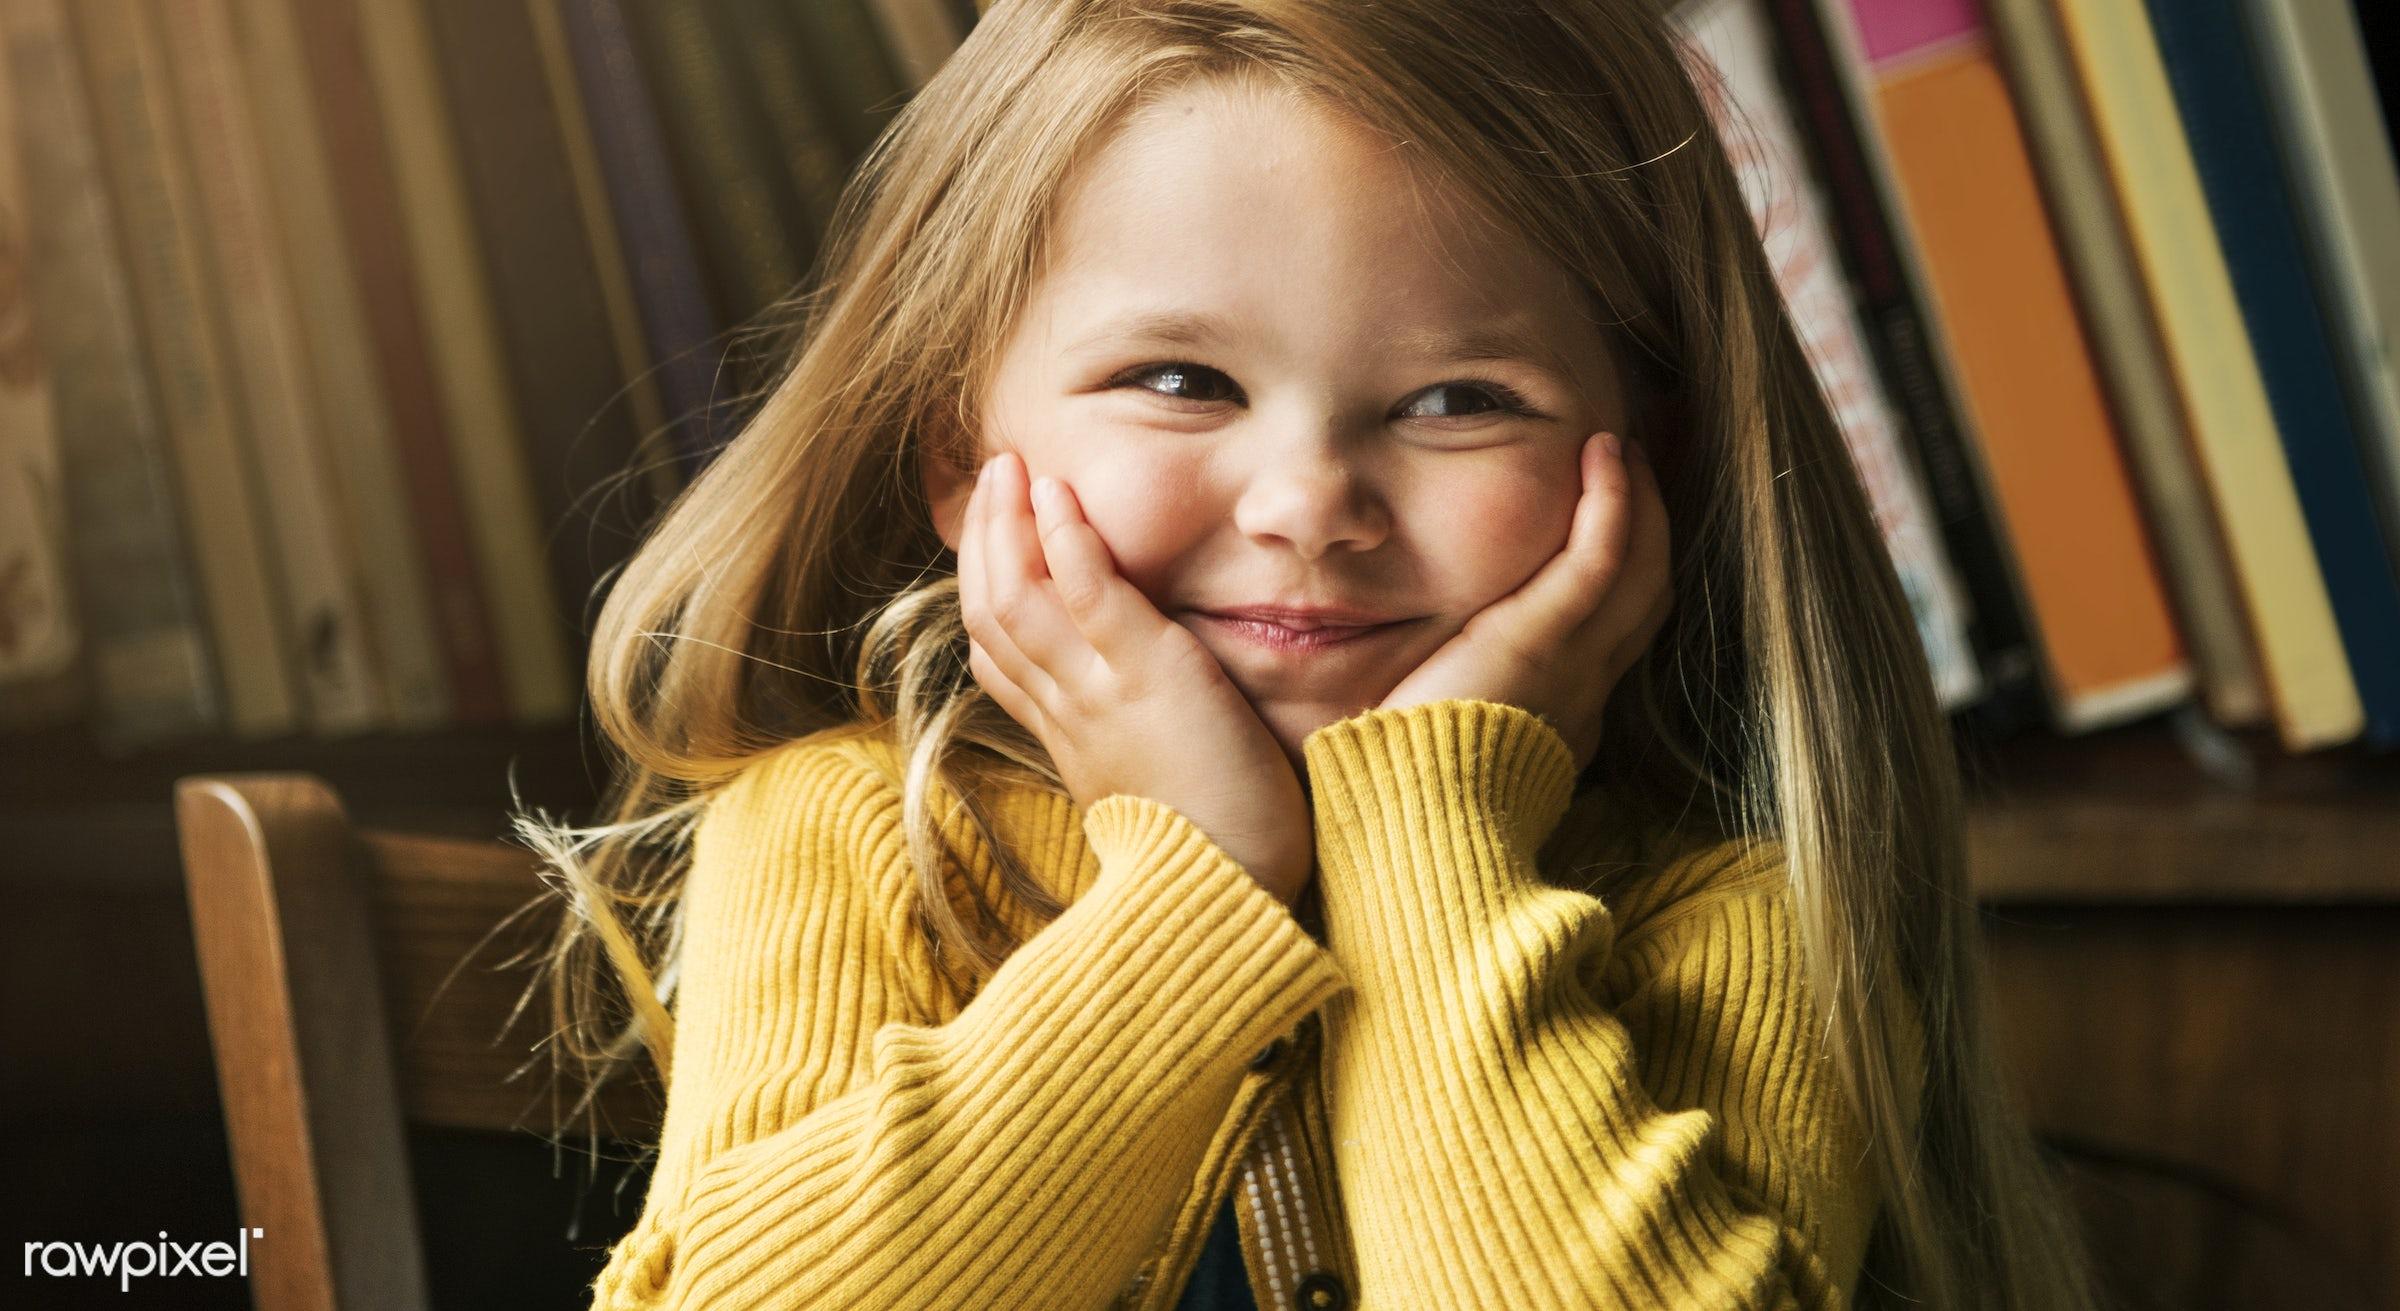 beautiful, bookshelf, calm, caucasian, charming, cheerful, chilling, cute, elementary age, enjoyment, female, femininity,...